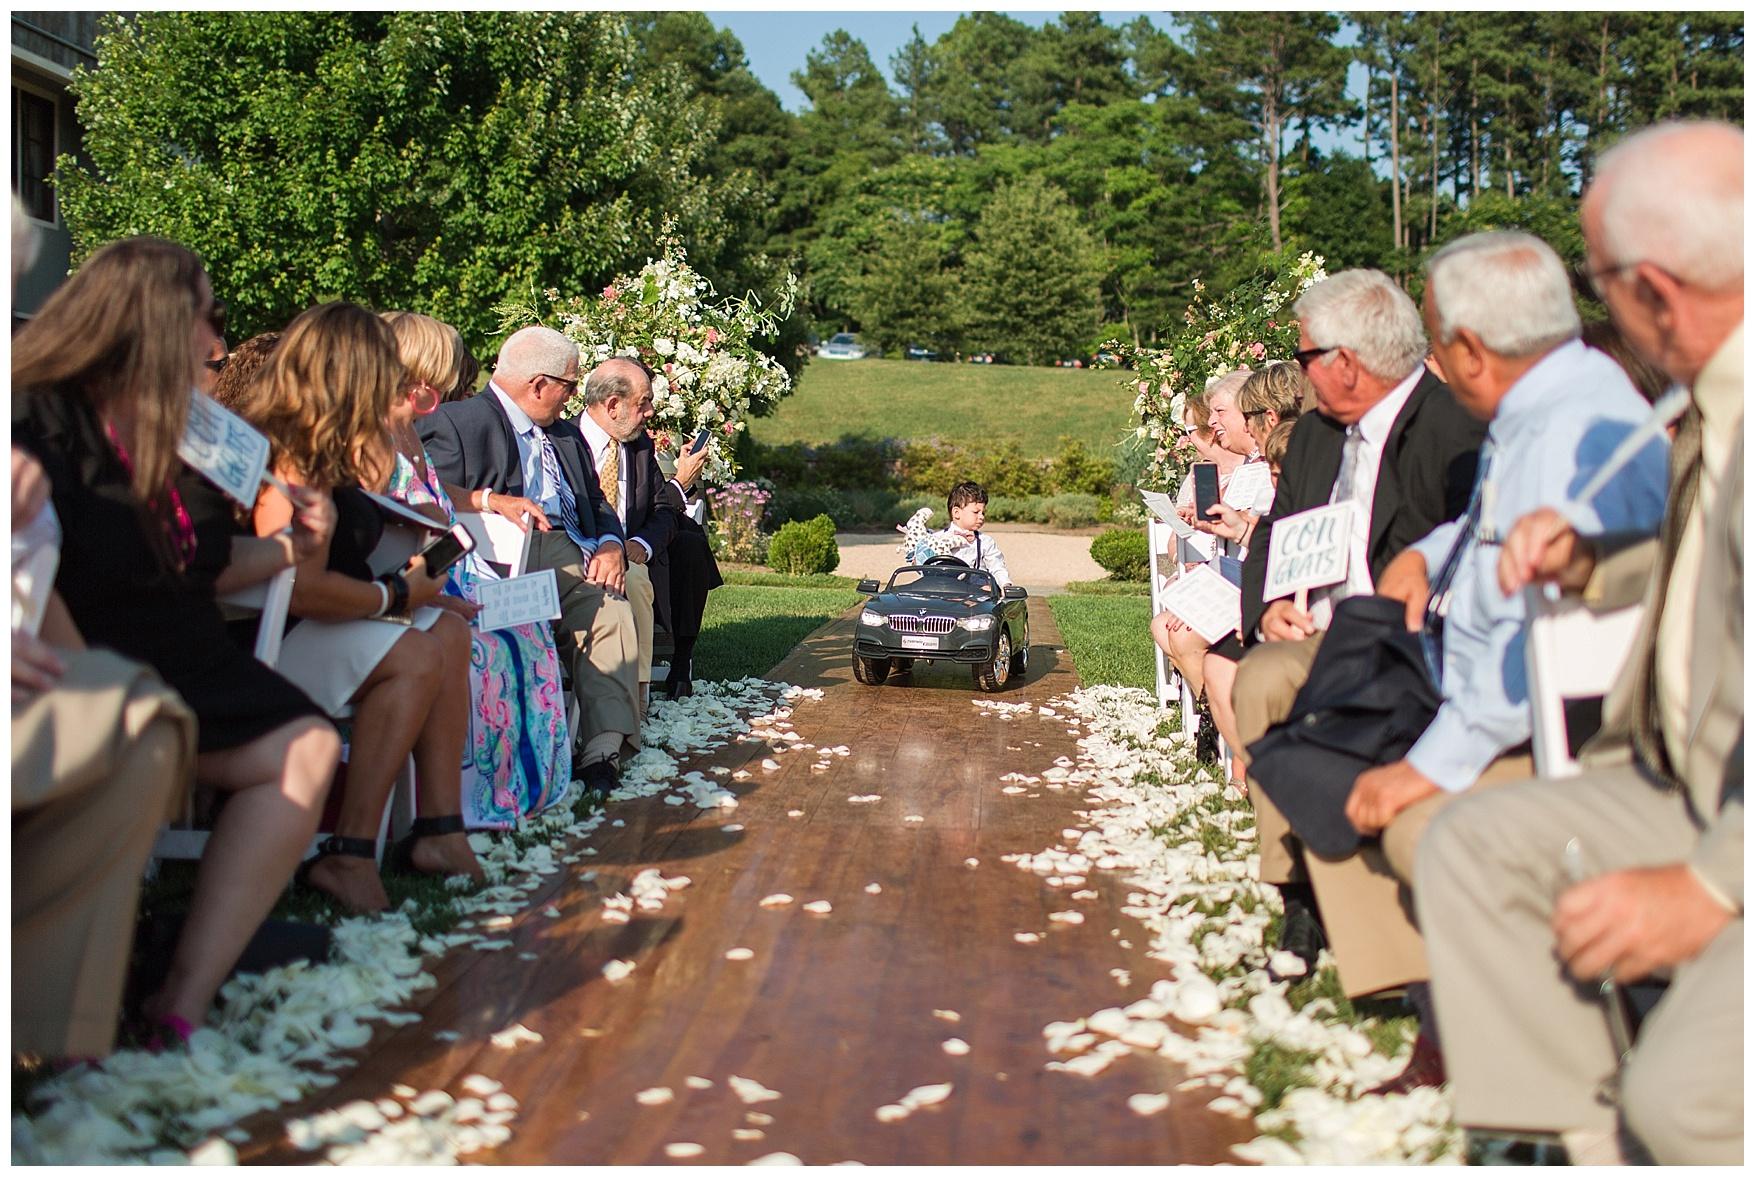 Pippin Hill Farm & Vineyard Wedding in Charlottesville, Virginia    Lynchburg and Charlottesville Wedding Photographer    Summer vineyard wedding in Central Virginia